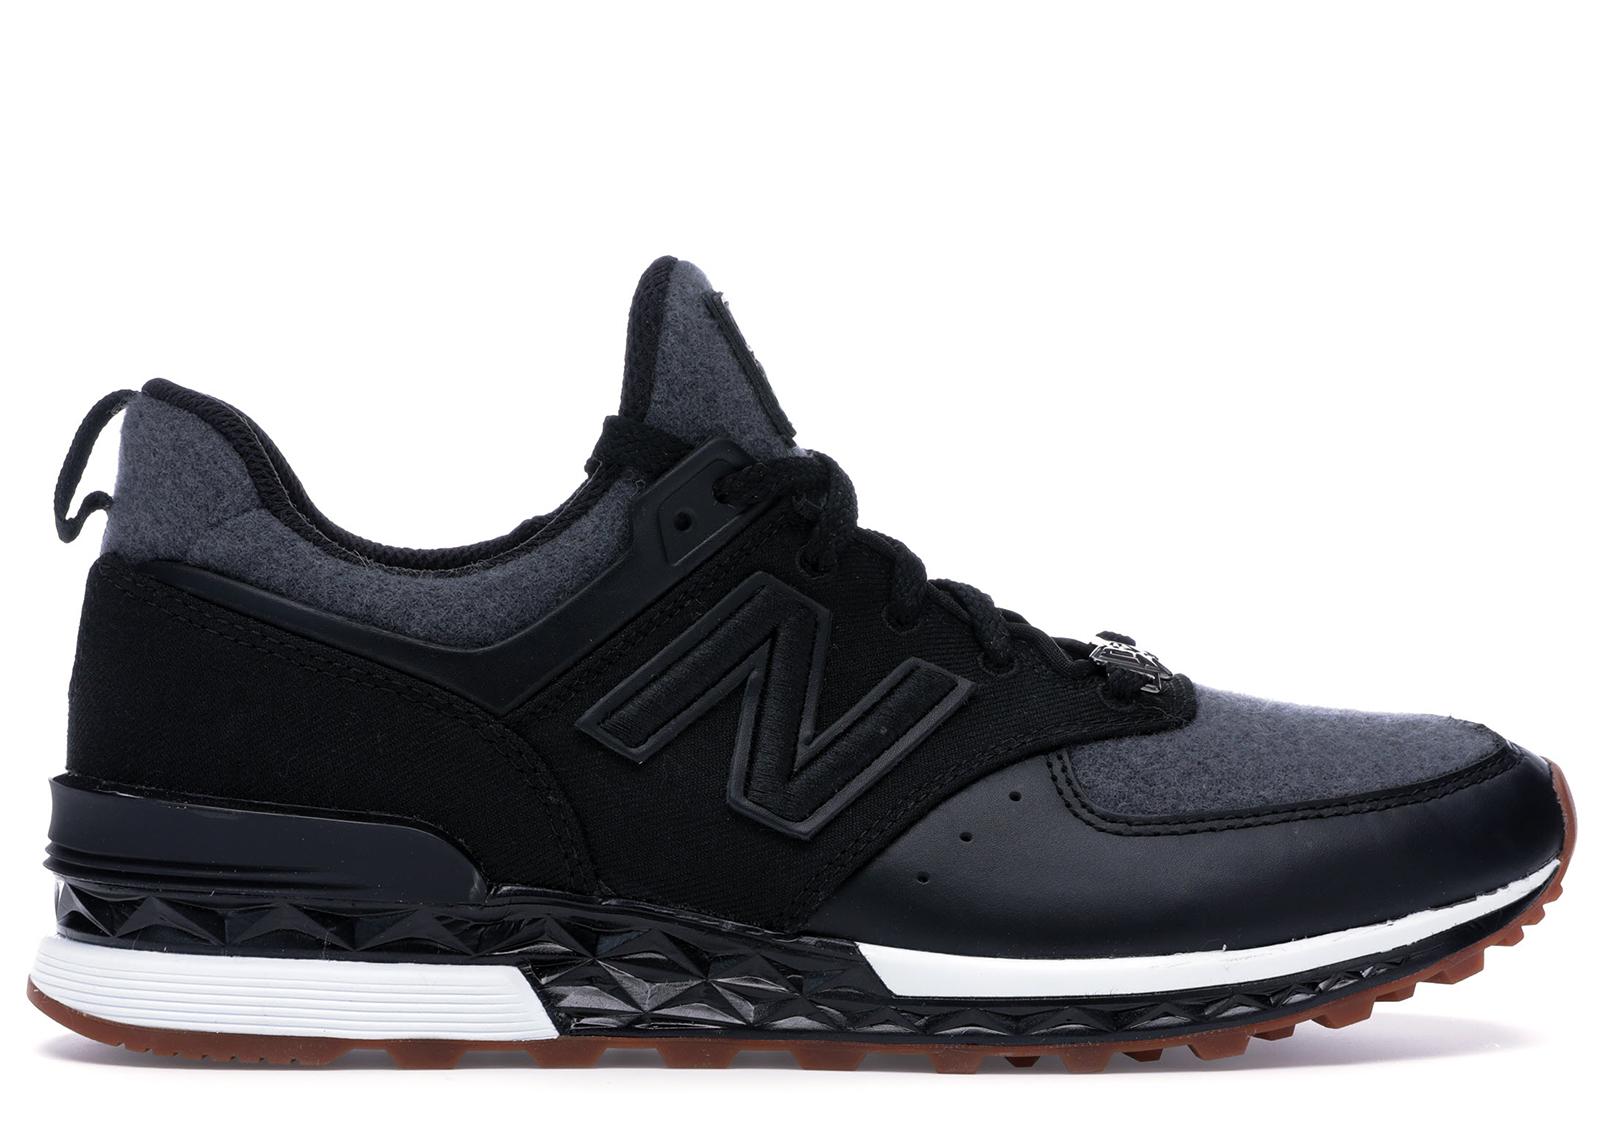 New Balance 574 Sport New Era Black